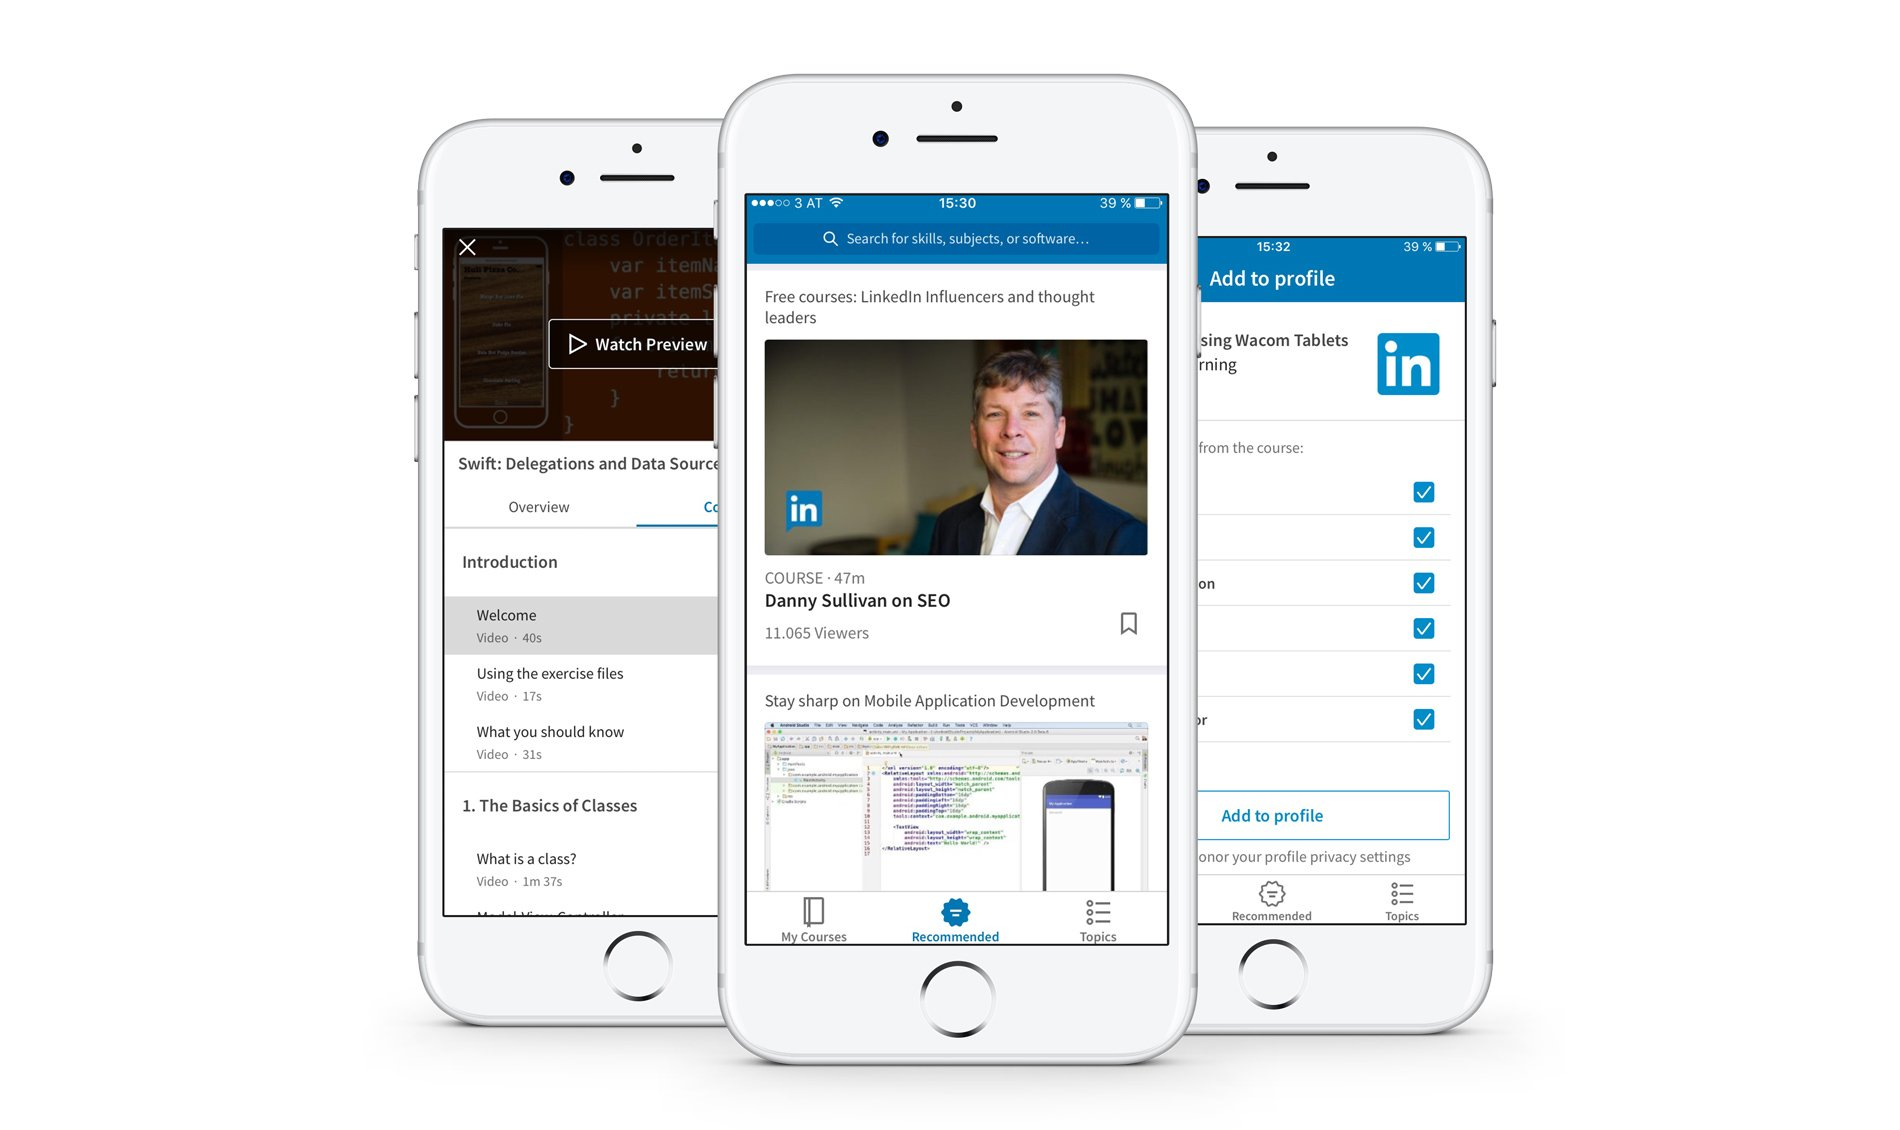 Linkedin learning iOS app screenshots.